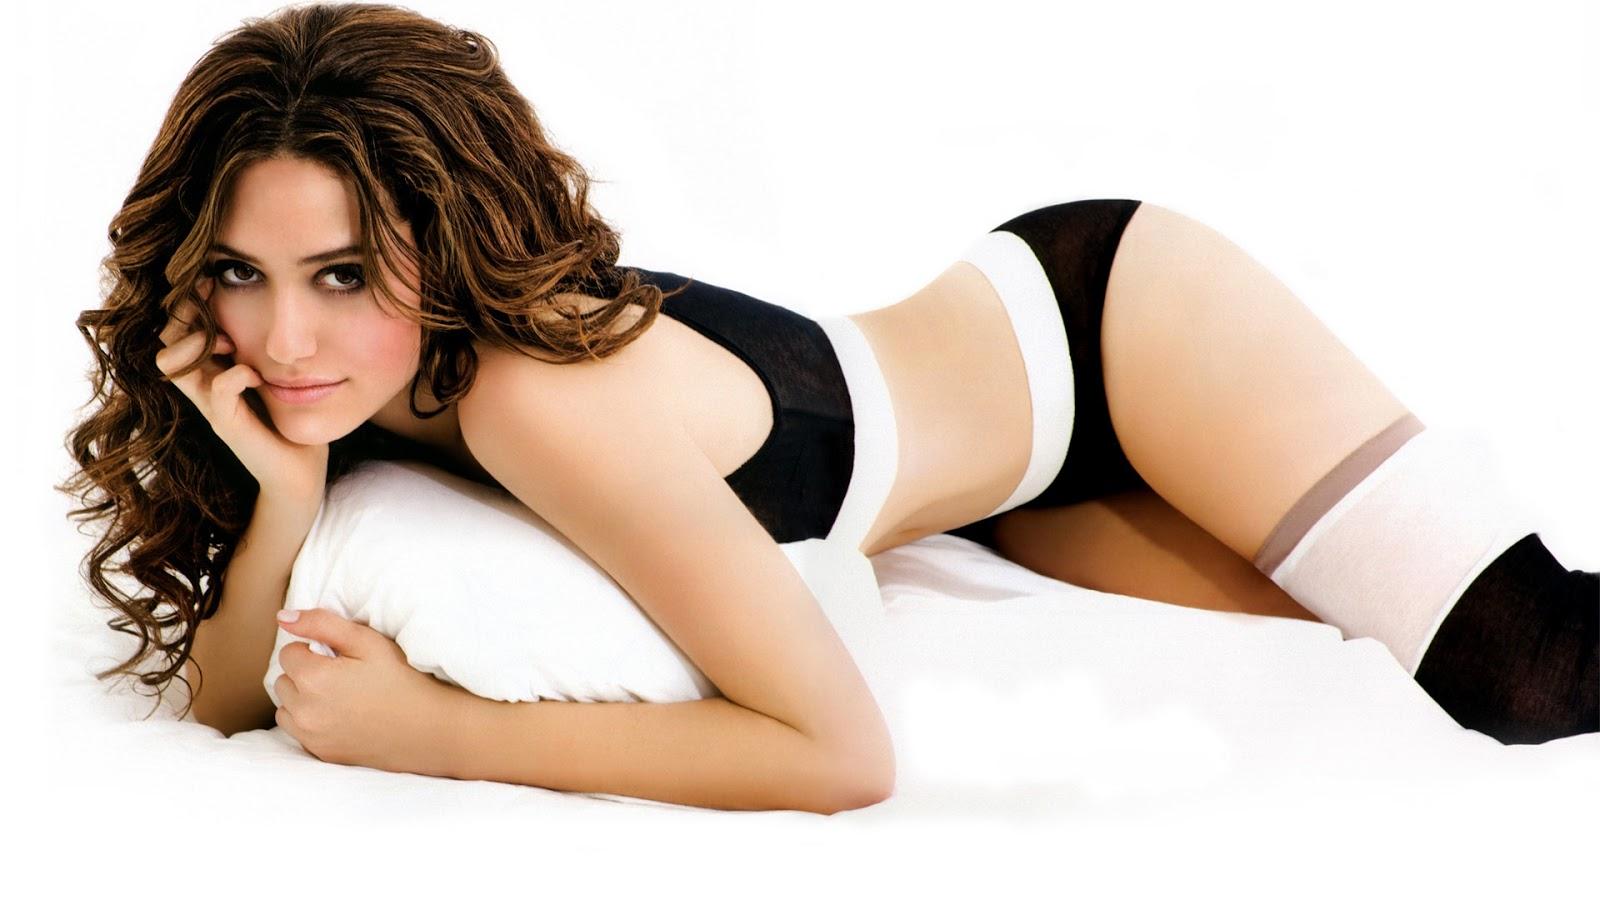 Hacked: Emmy Rossum Nude